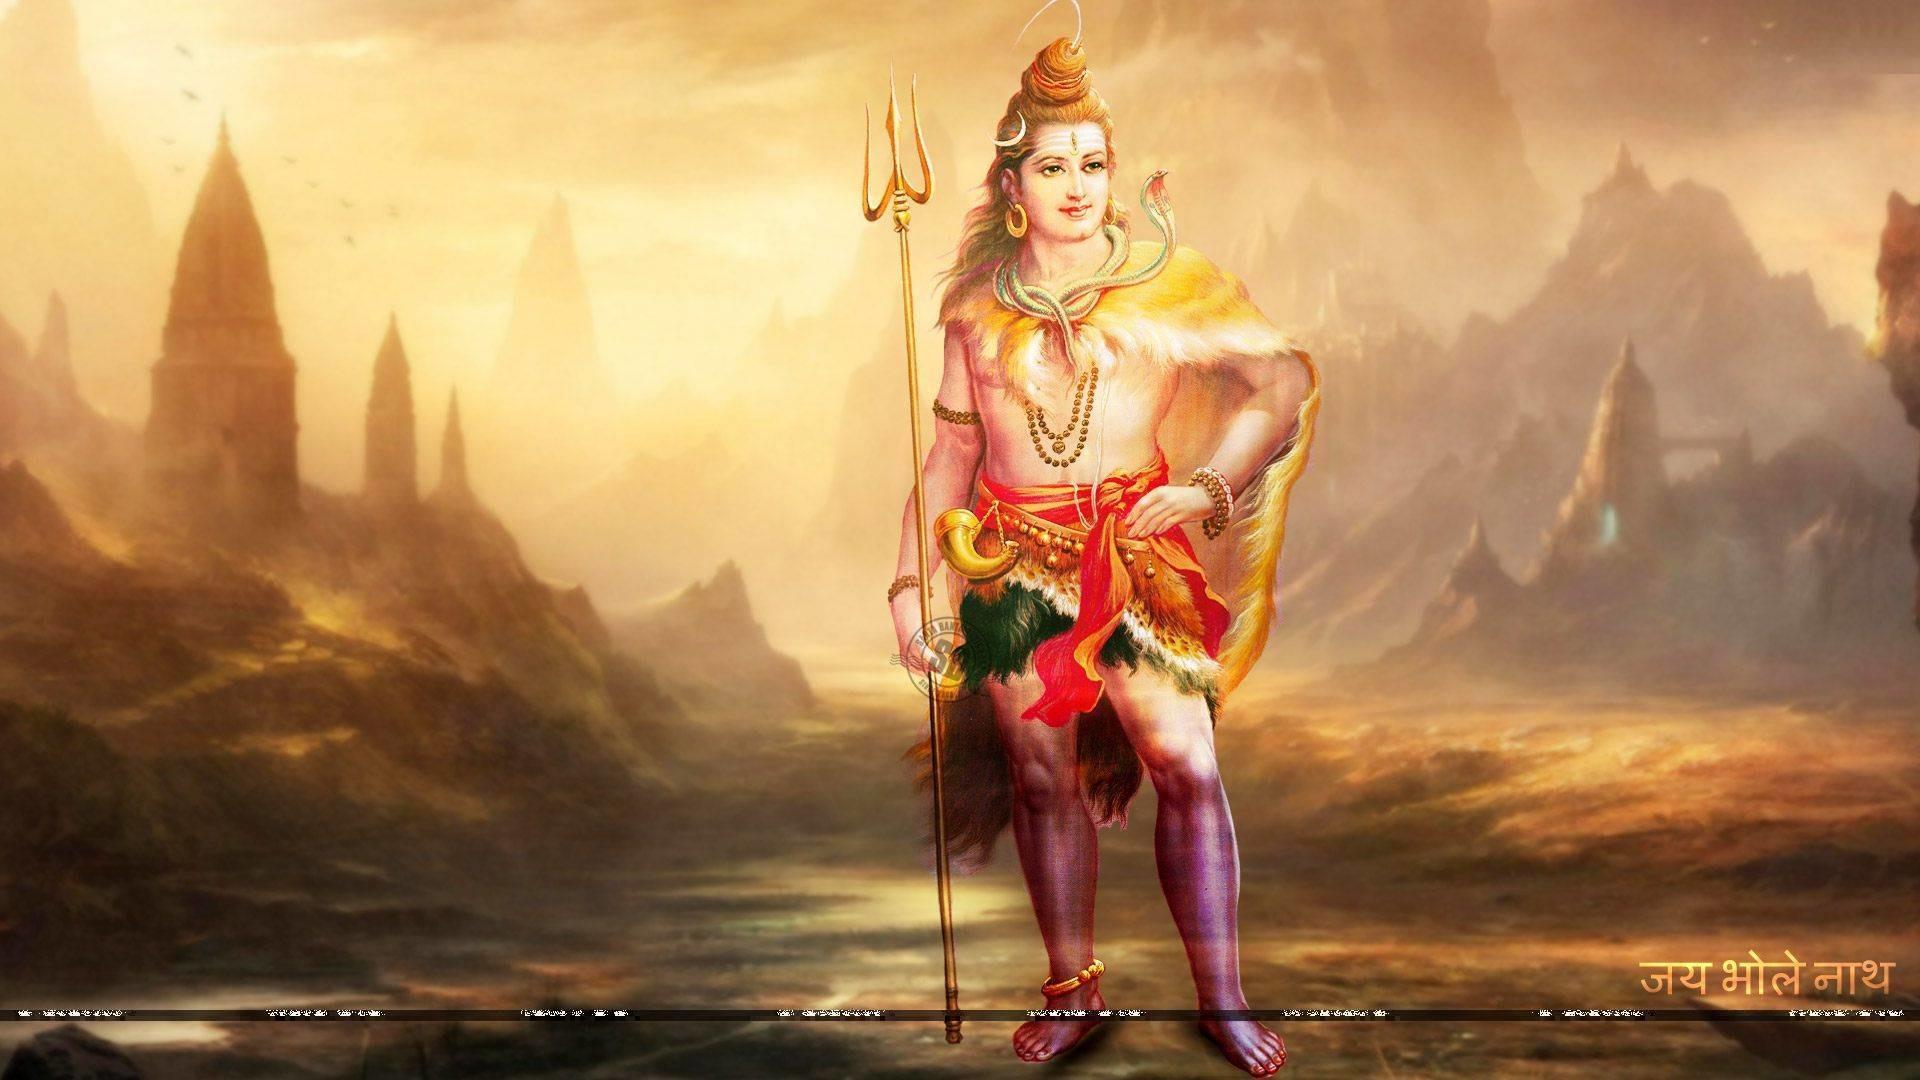 Lord Shiva Lord Shiva - Lord Shiva Full Hd - HD Wallpaper